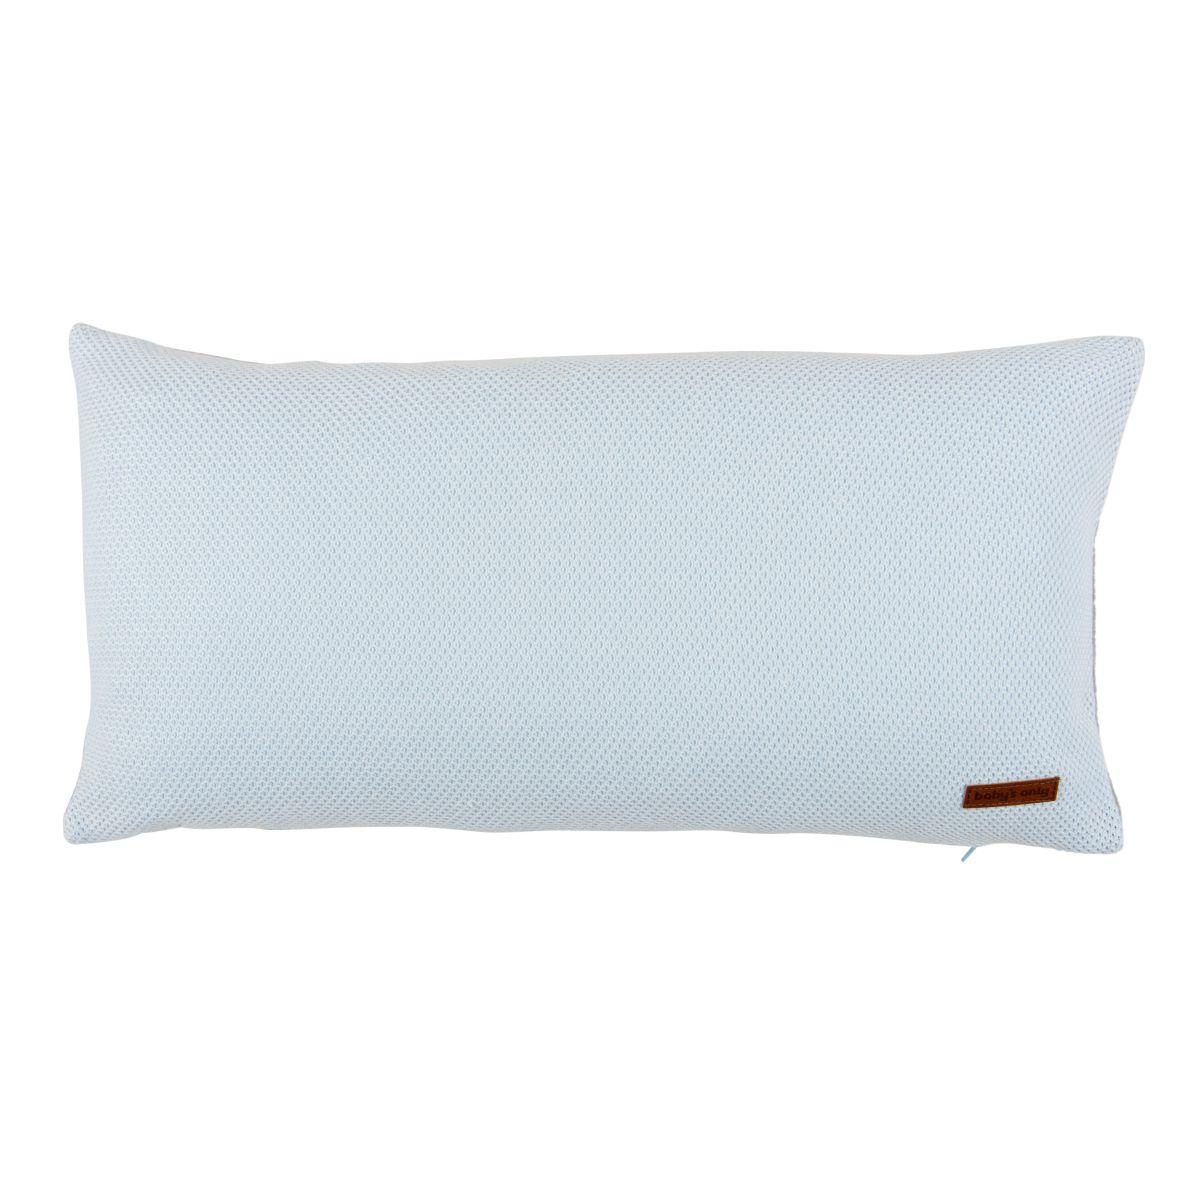 pillow classic powder blue 60x30